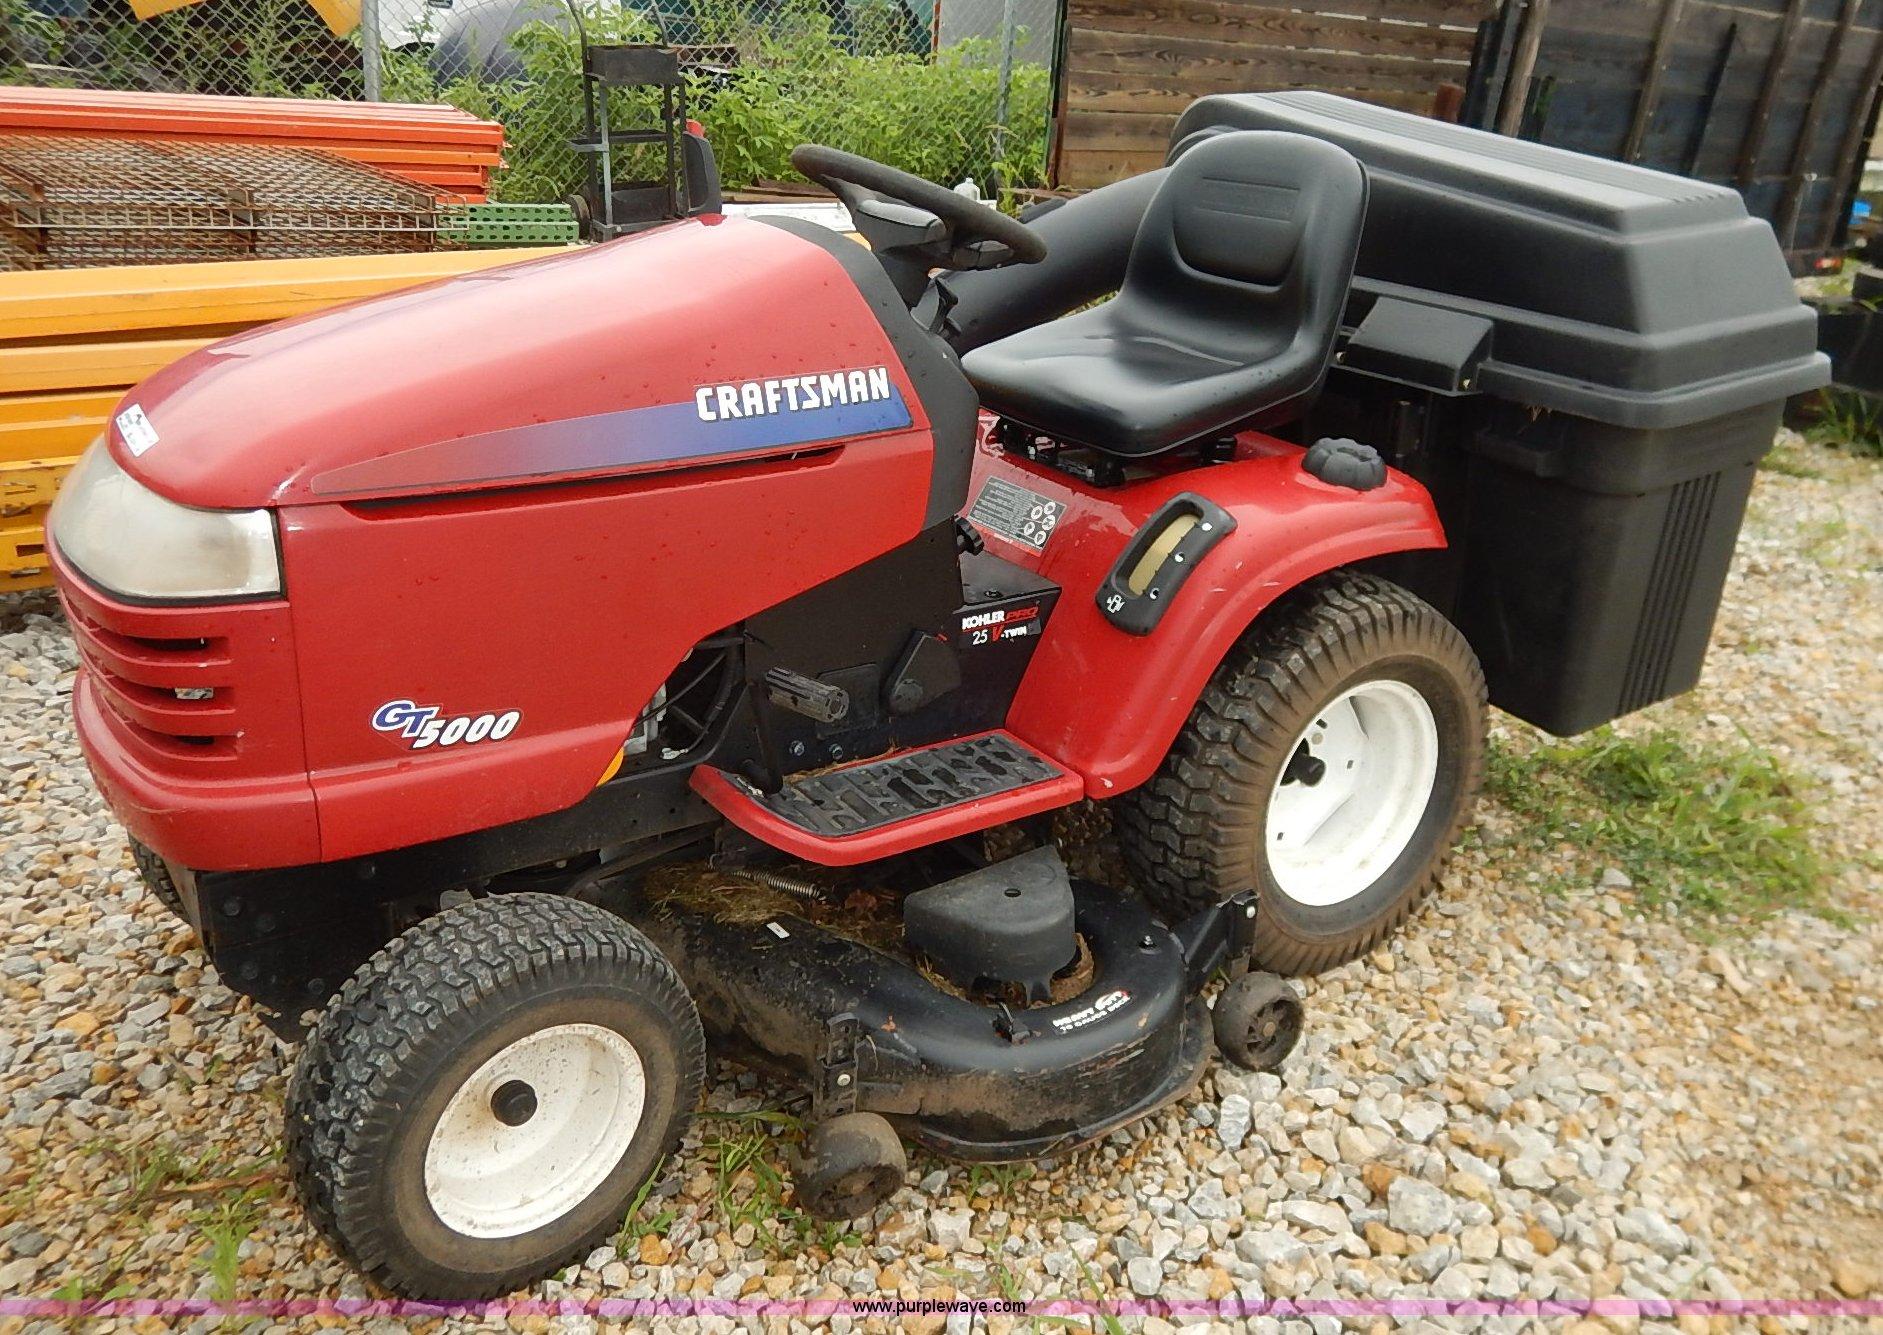 hight resolution of bo9994 image for item bo9994 craftsman gt5000 riding mower